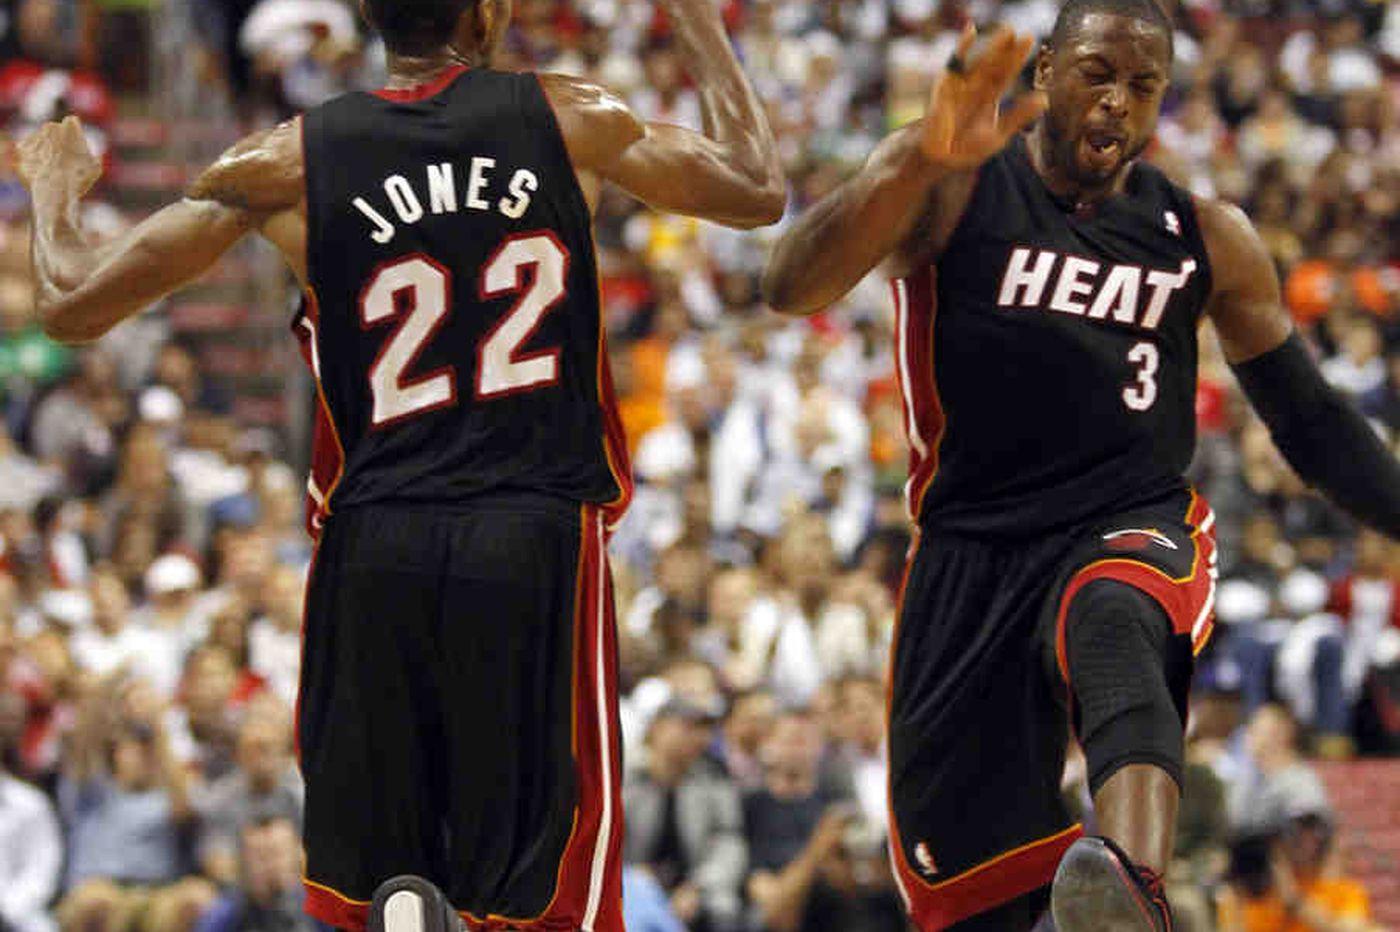 Heat's three stars not in sync yet